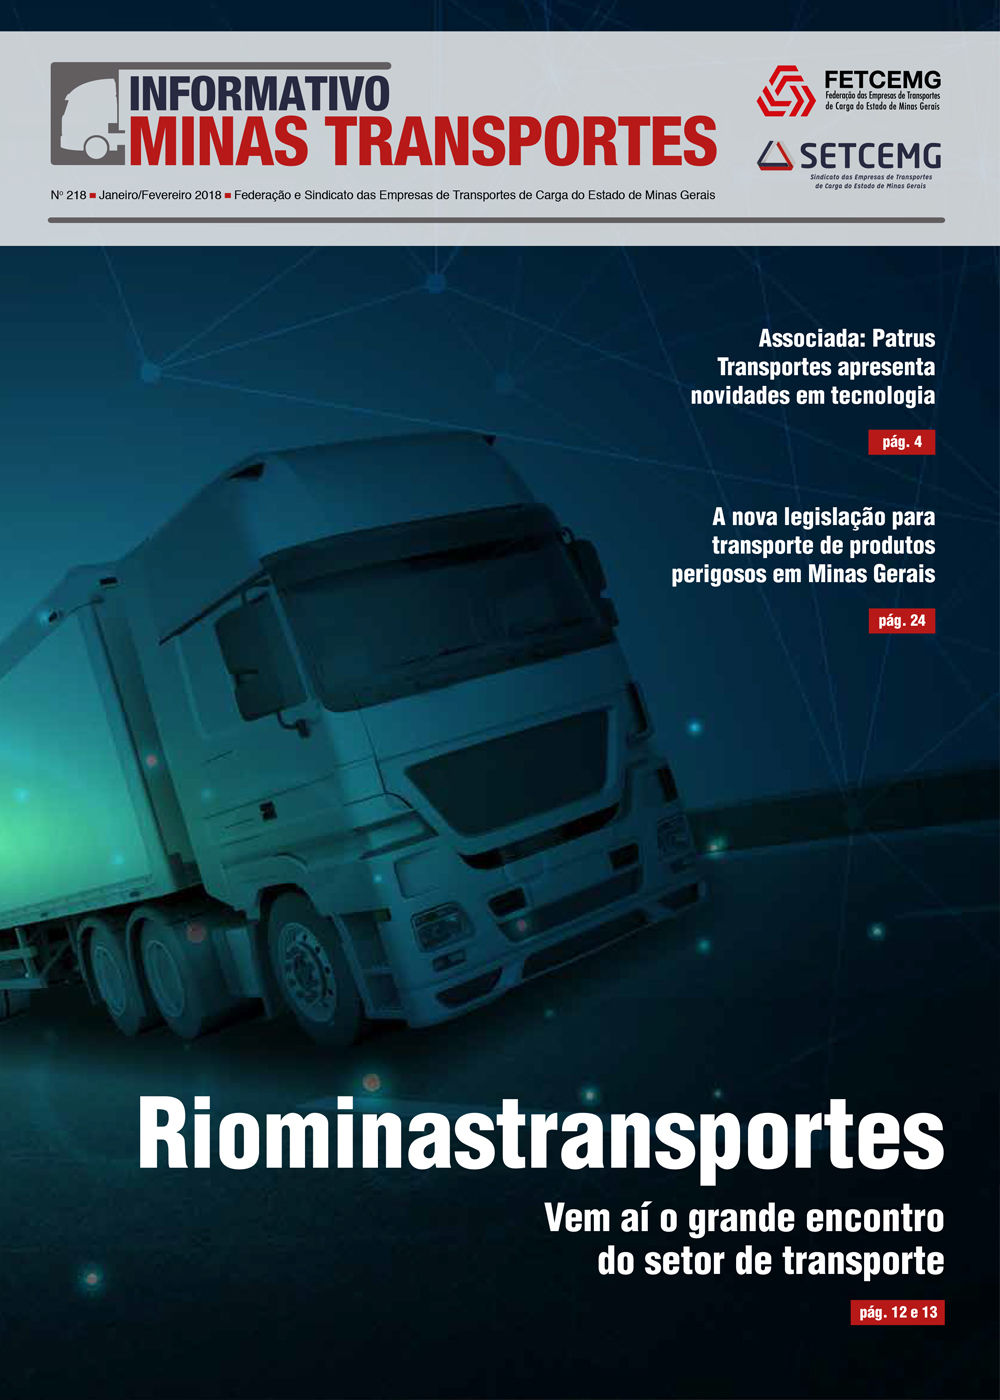 Informativo Minas Transportes - nº 218